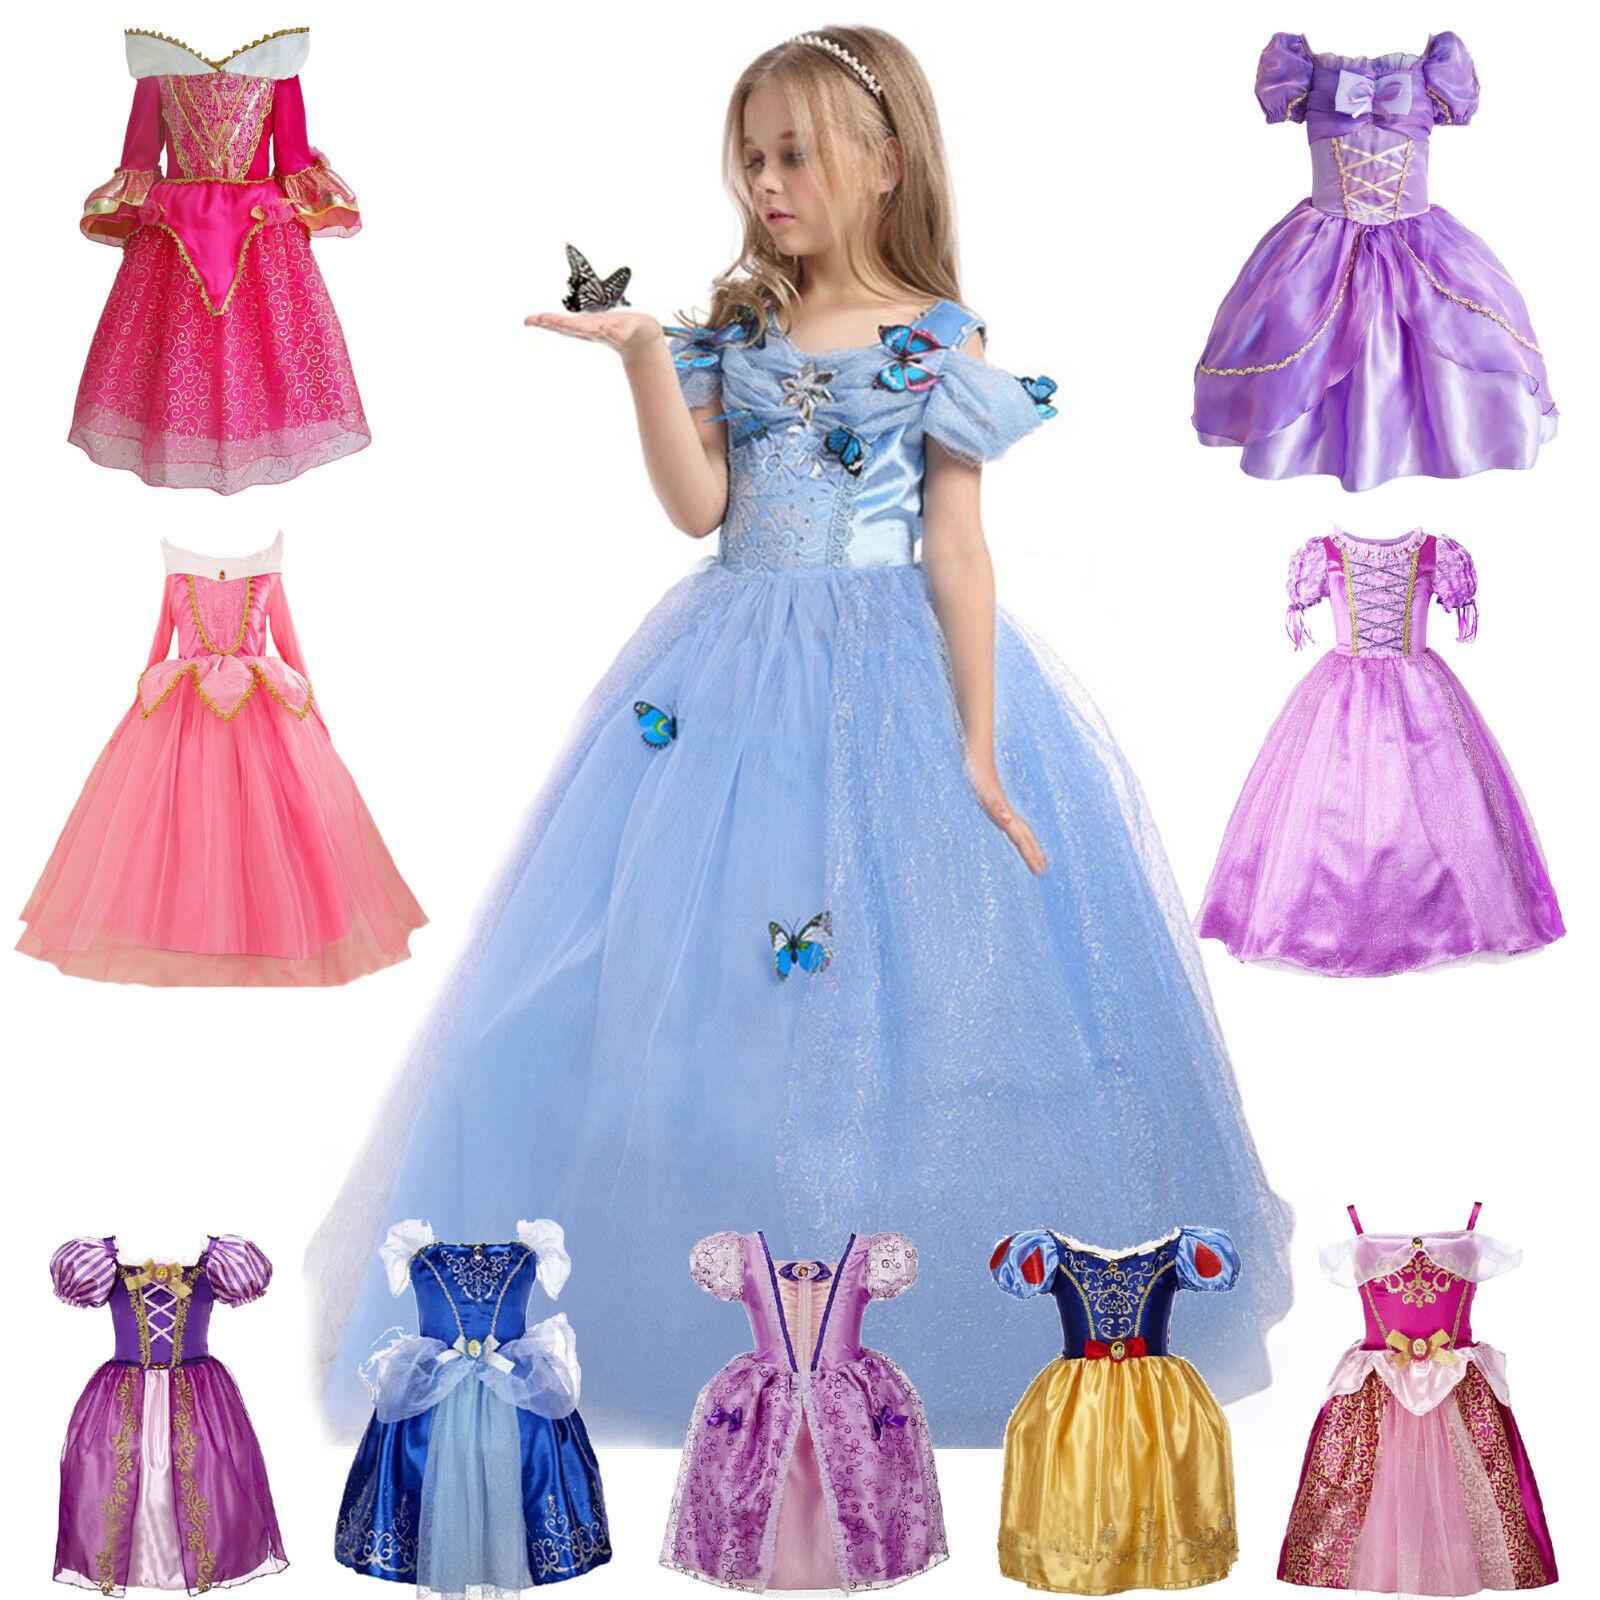 Sofia Princess Dress Kids Cosplay Costumes Girls New Arrival: Girls' Clothing Princess Belle Cinderella Elsa Sofia